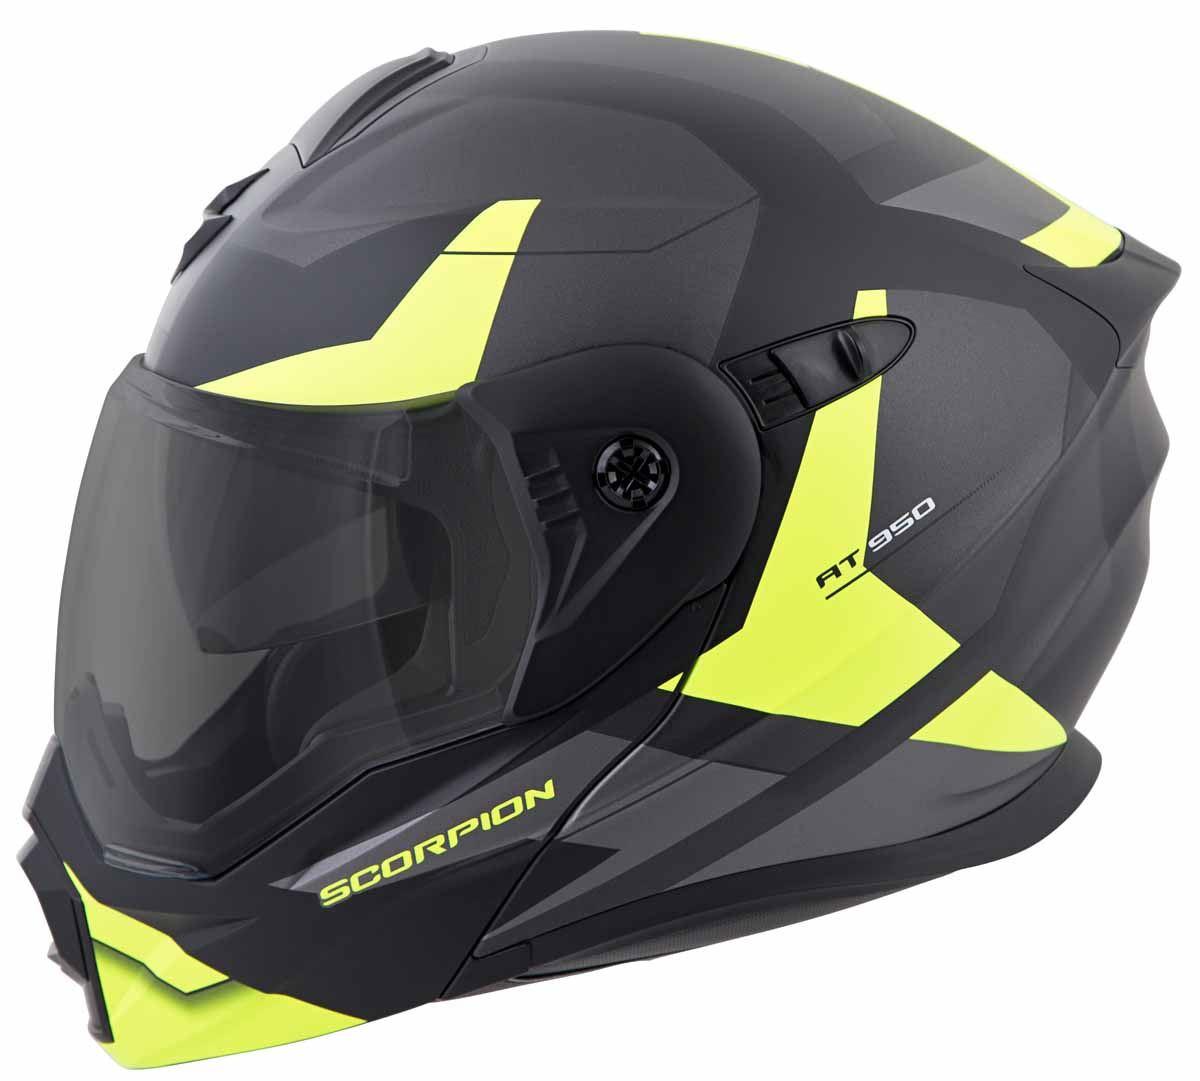 Scorpion-EXO-AT950-Helmet-Flip-Up-Modular-Dual-Sport-Adventure-ADV-DOT-XS-3XL miniature 39